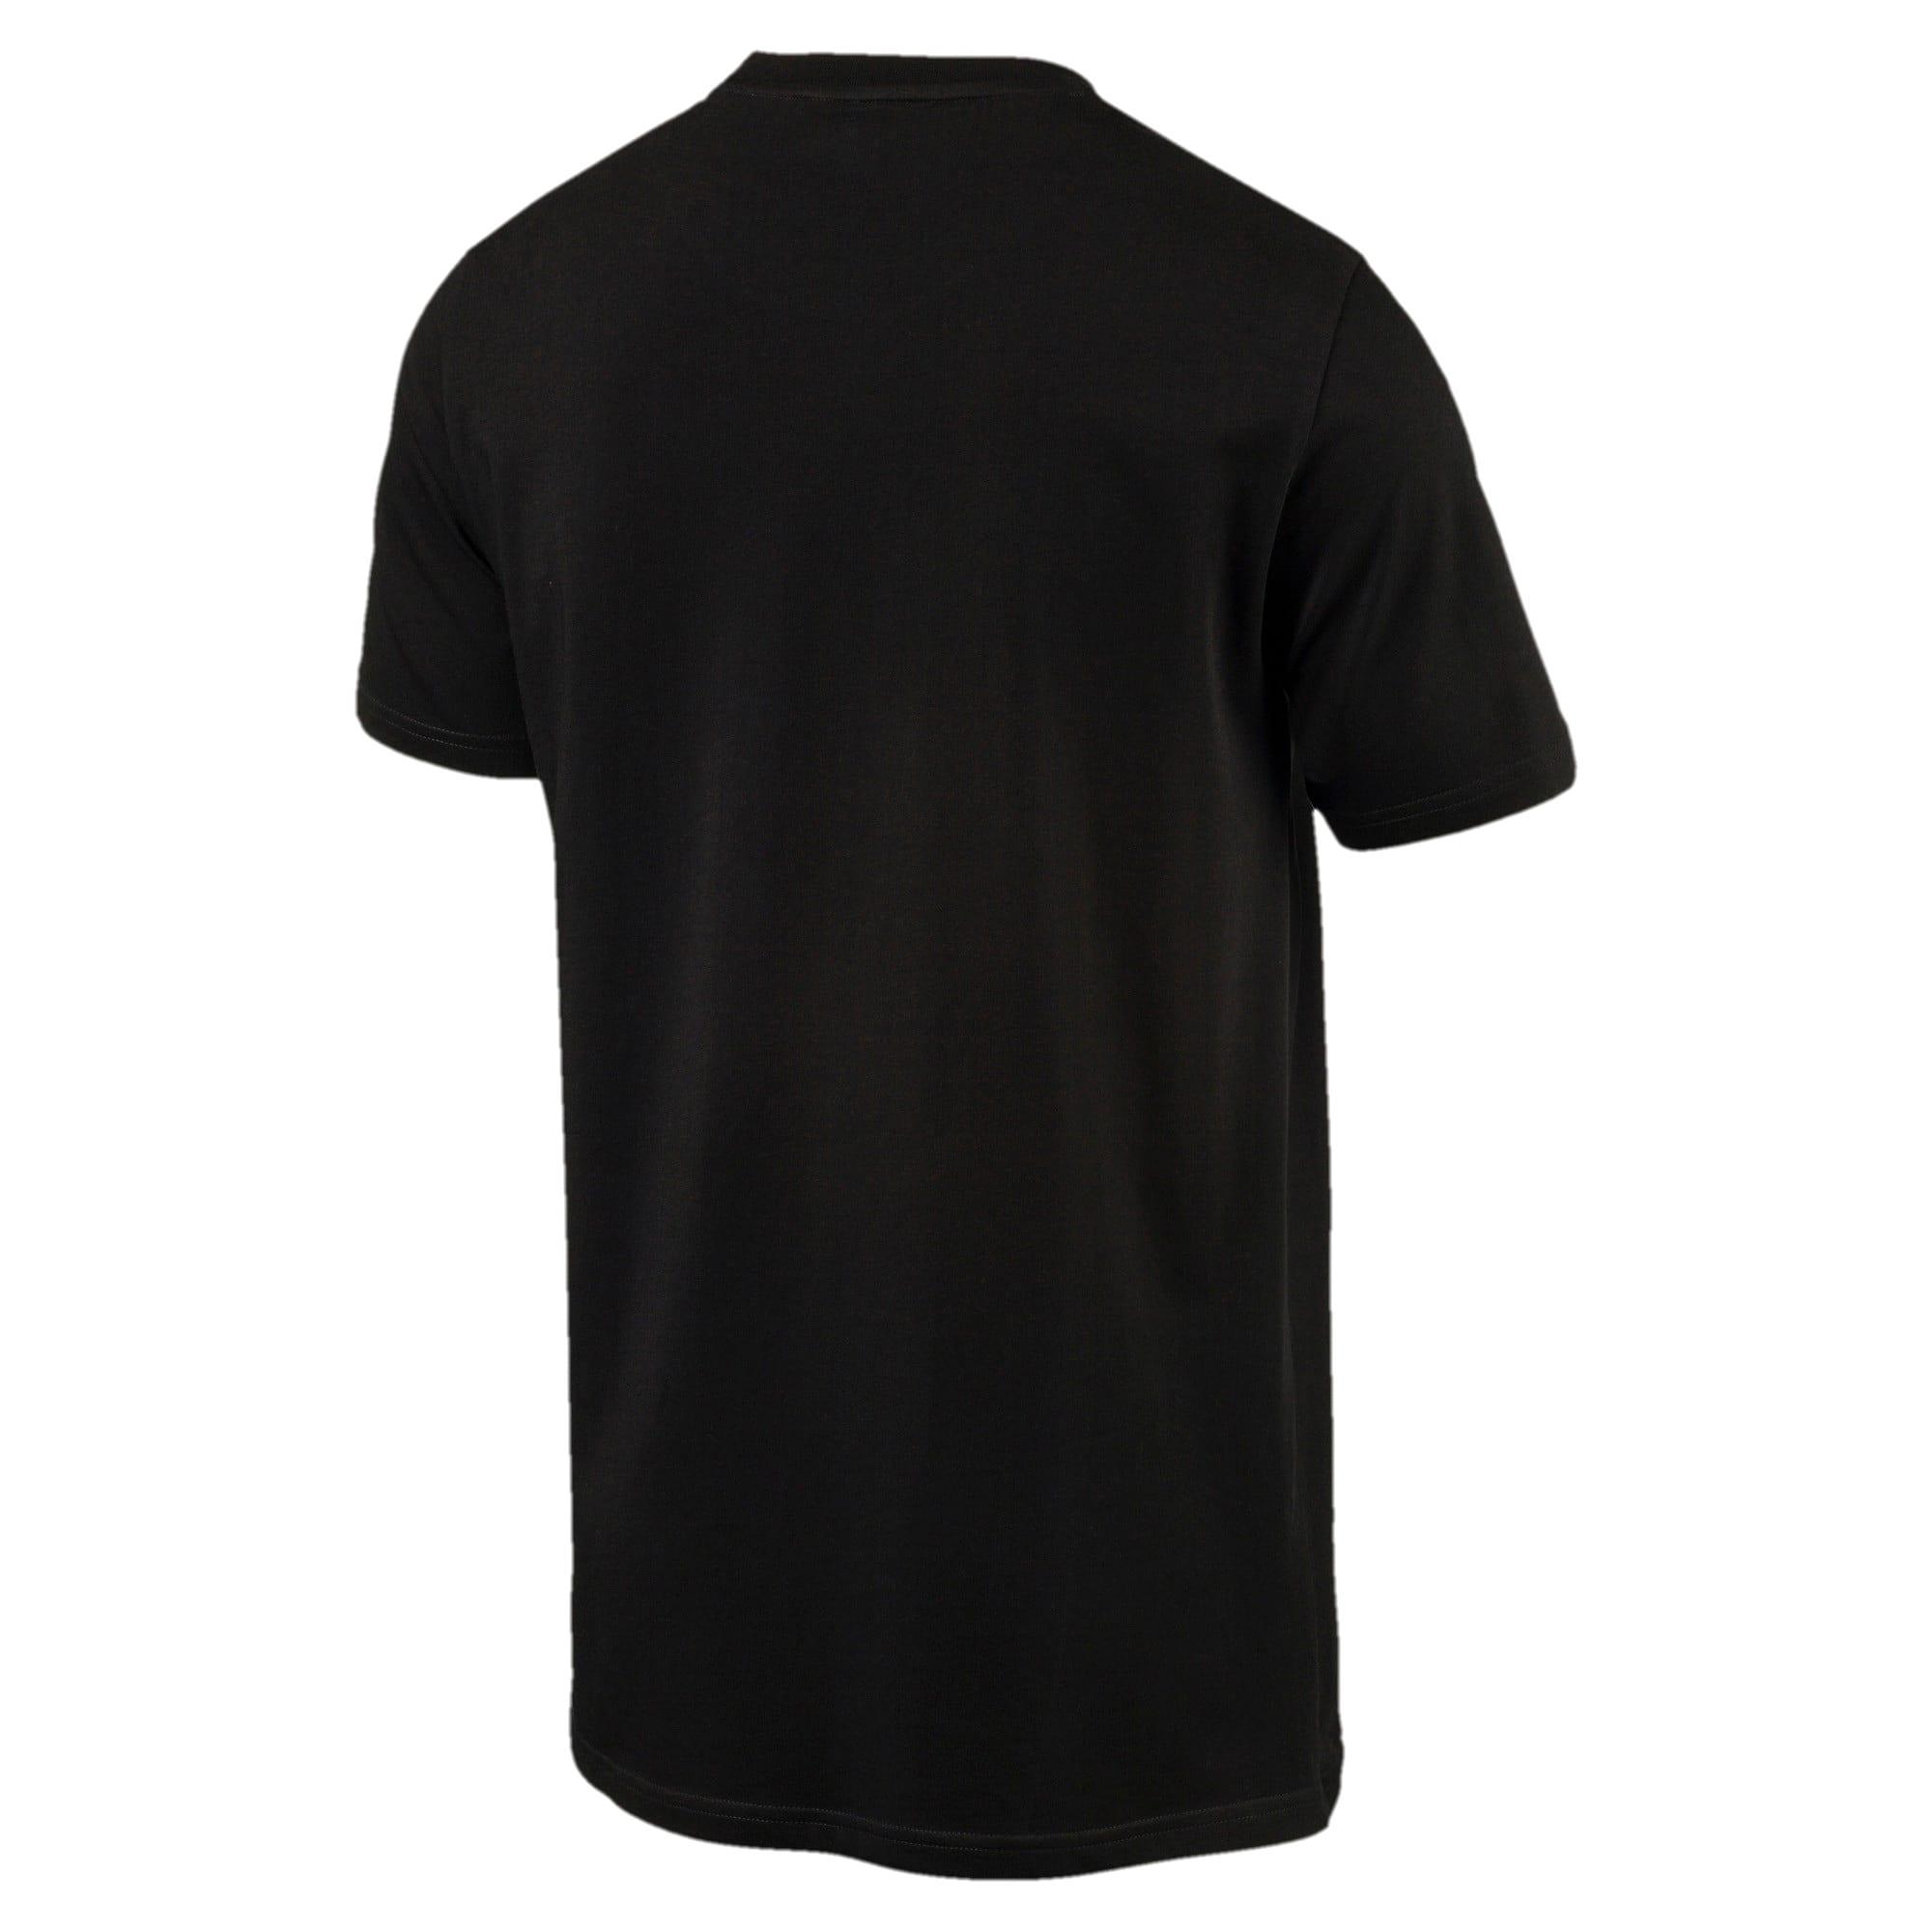 Thumbnail 2 of Archive Men's Logo T-Shirt, Cotton Black, medium-IND